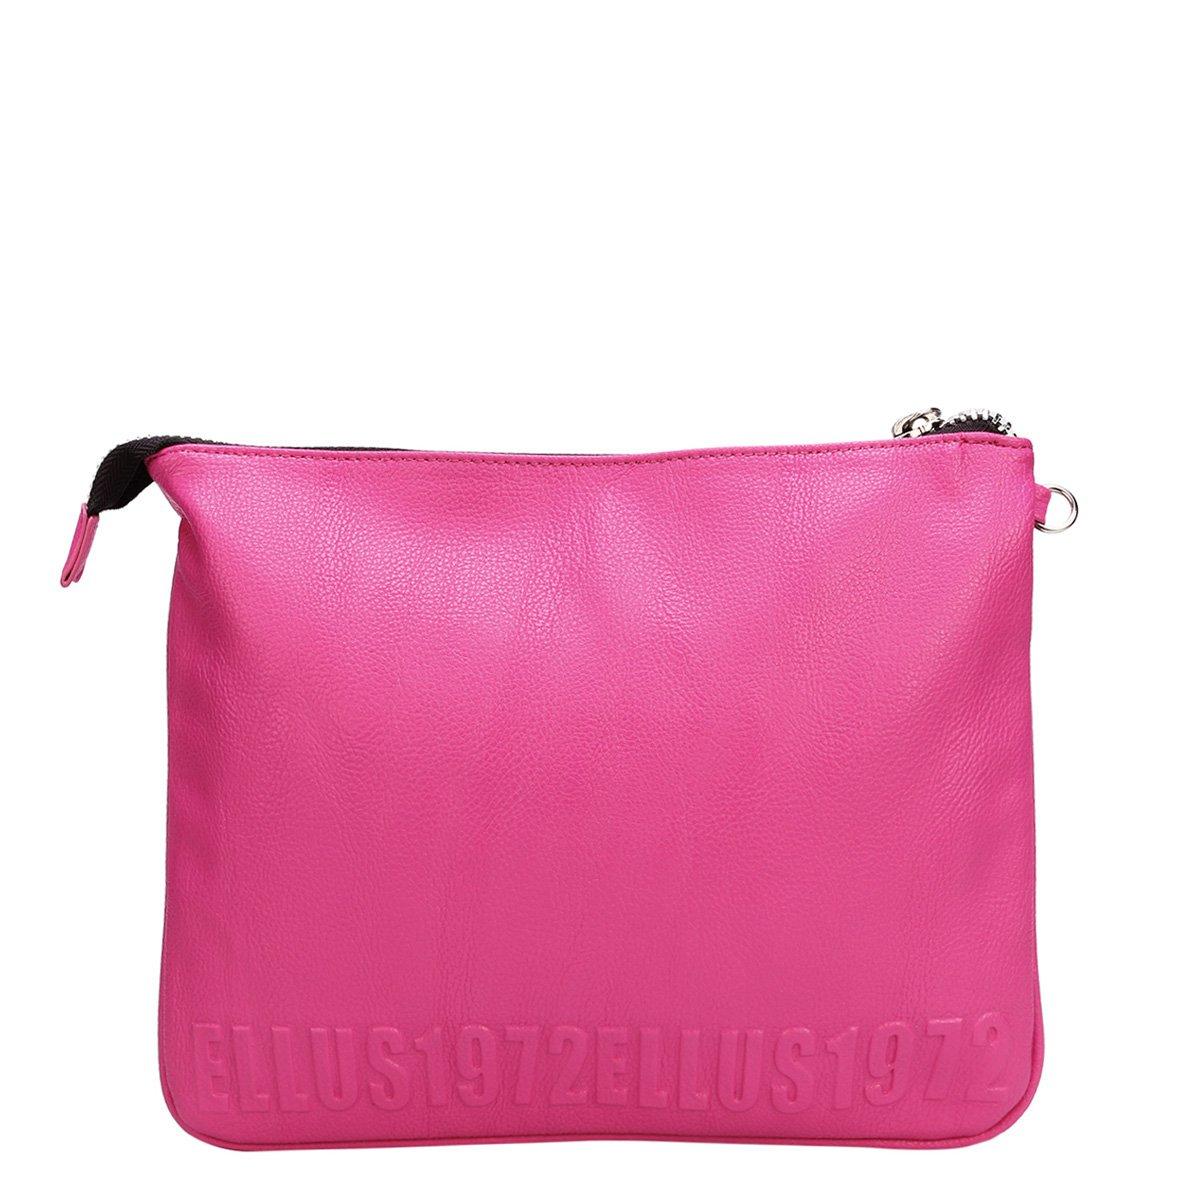 Bolsa Ellus Clutch Alto Relevo : Bolsa ellus clutch alto relevo pink